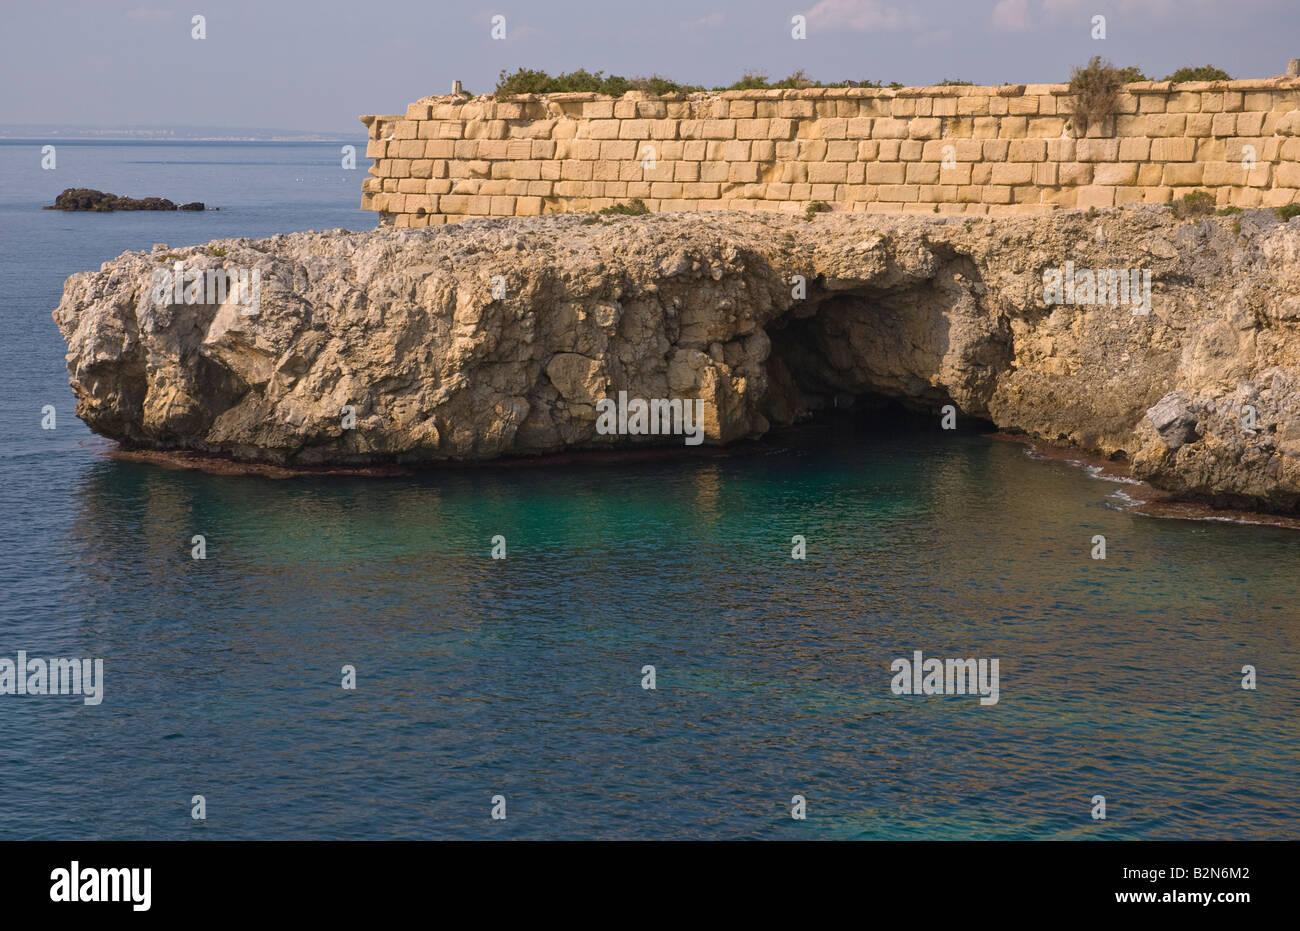 Cove de Llop Mari Pirates Cove à l'île de Tabarca Espagne continentale Photo Stock